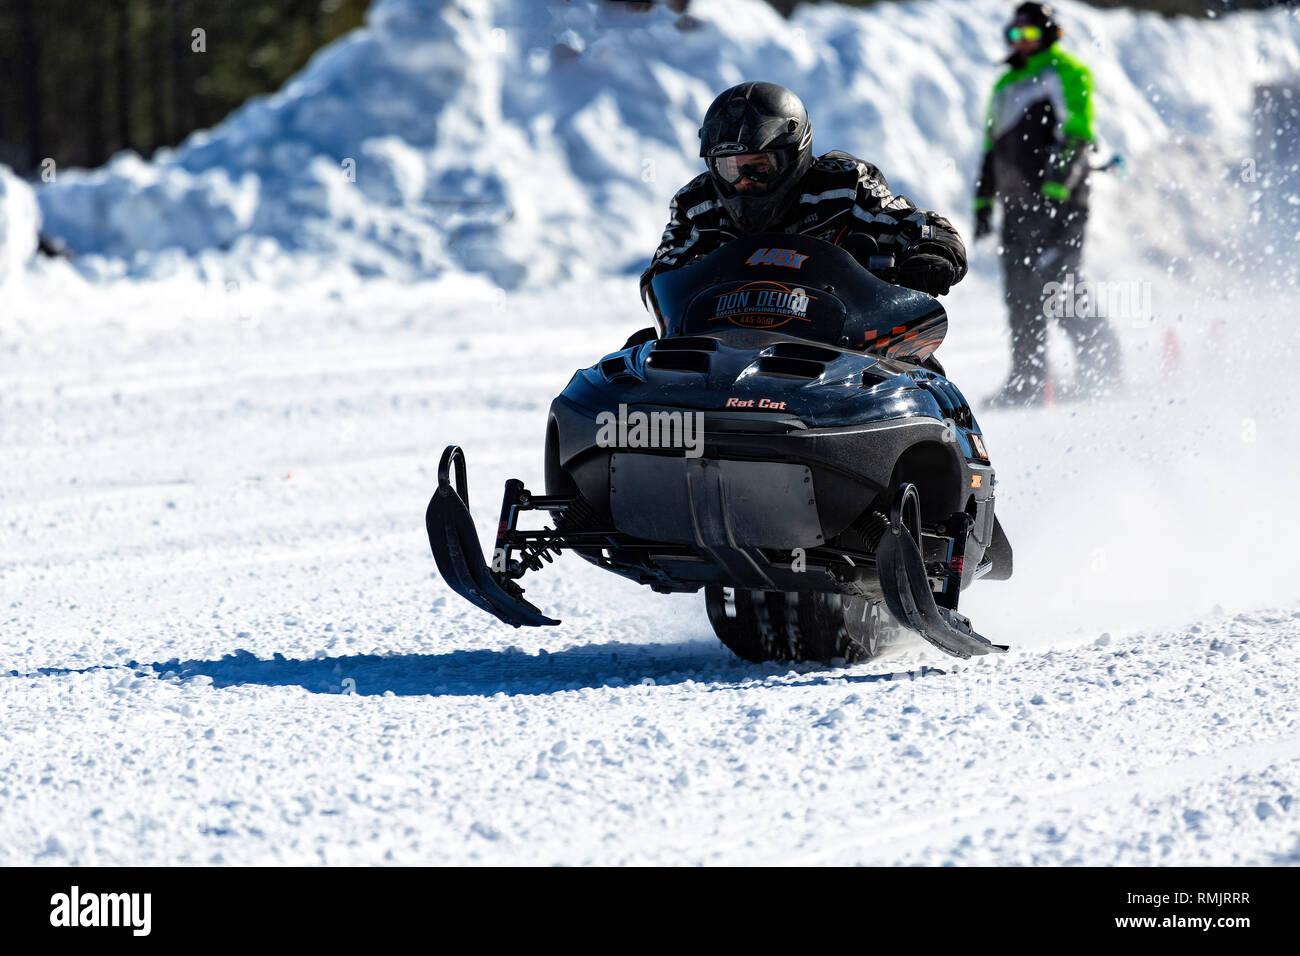 Snowmobile Racing Deep River Ontario Canada - Stock Image